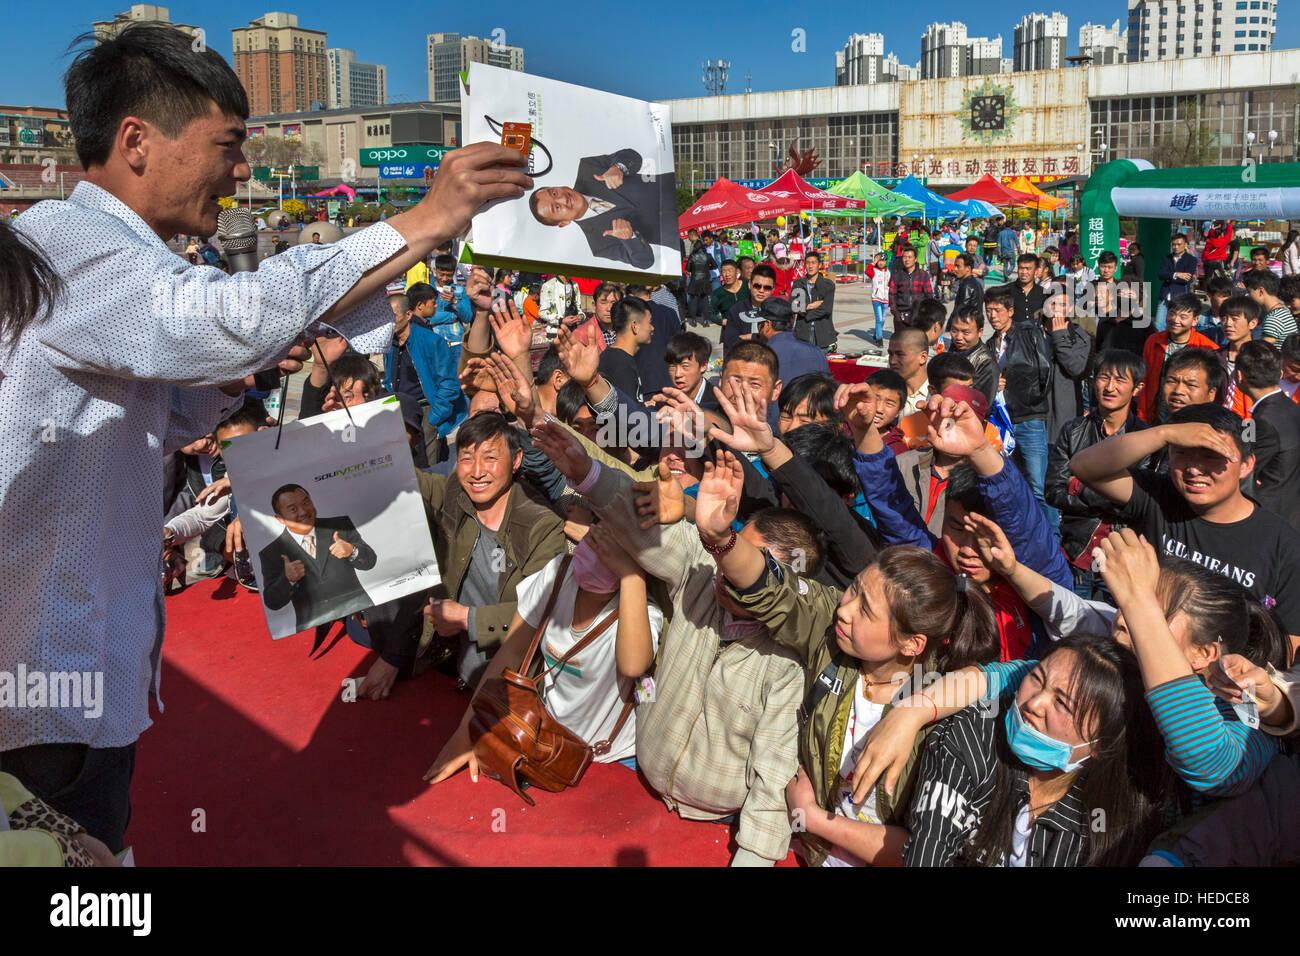 Chinese trader selling at public auction, Nanmen Square, Yinchuan, Ningxia, China - Stock Image